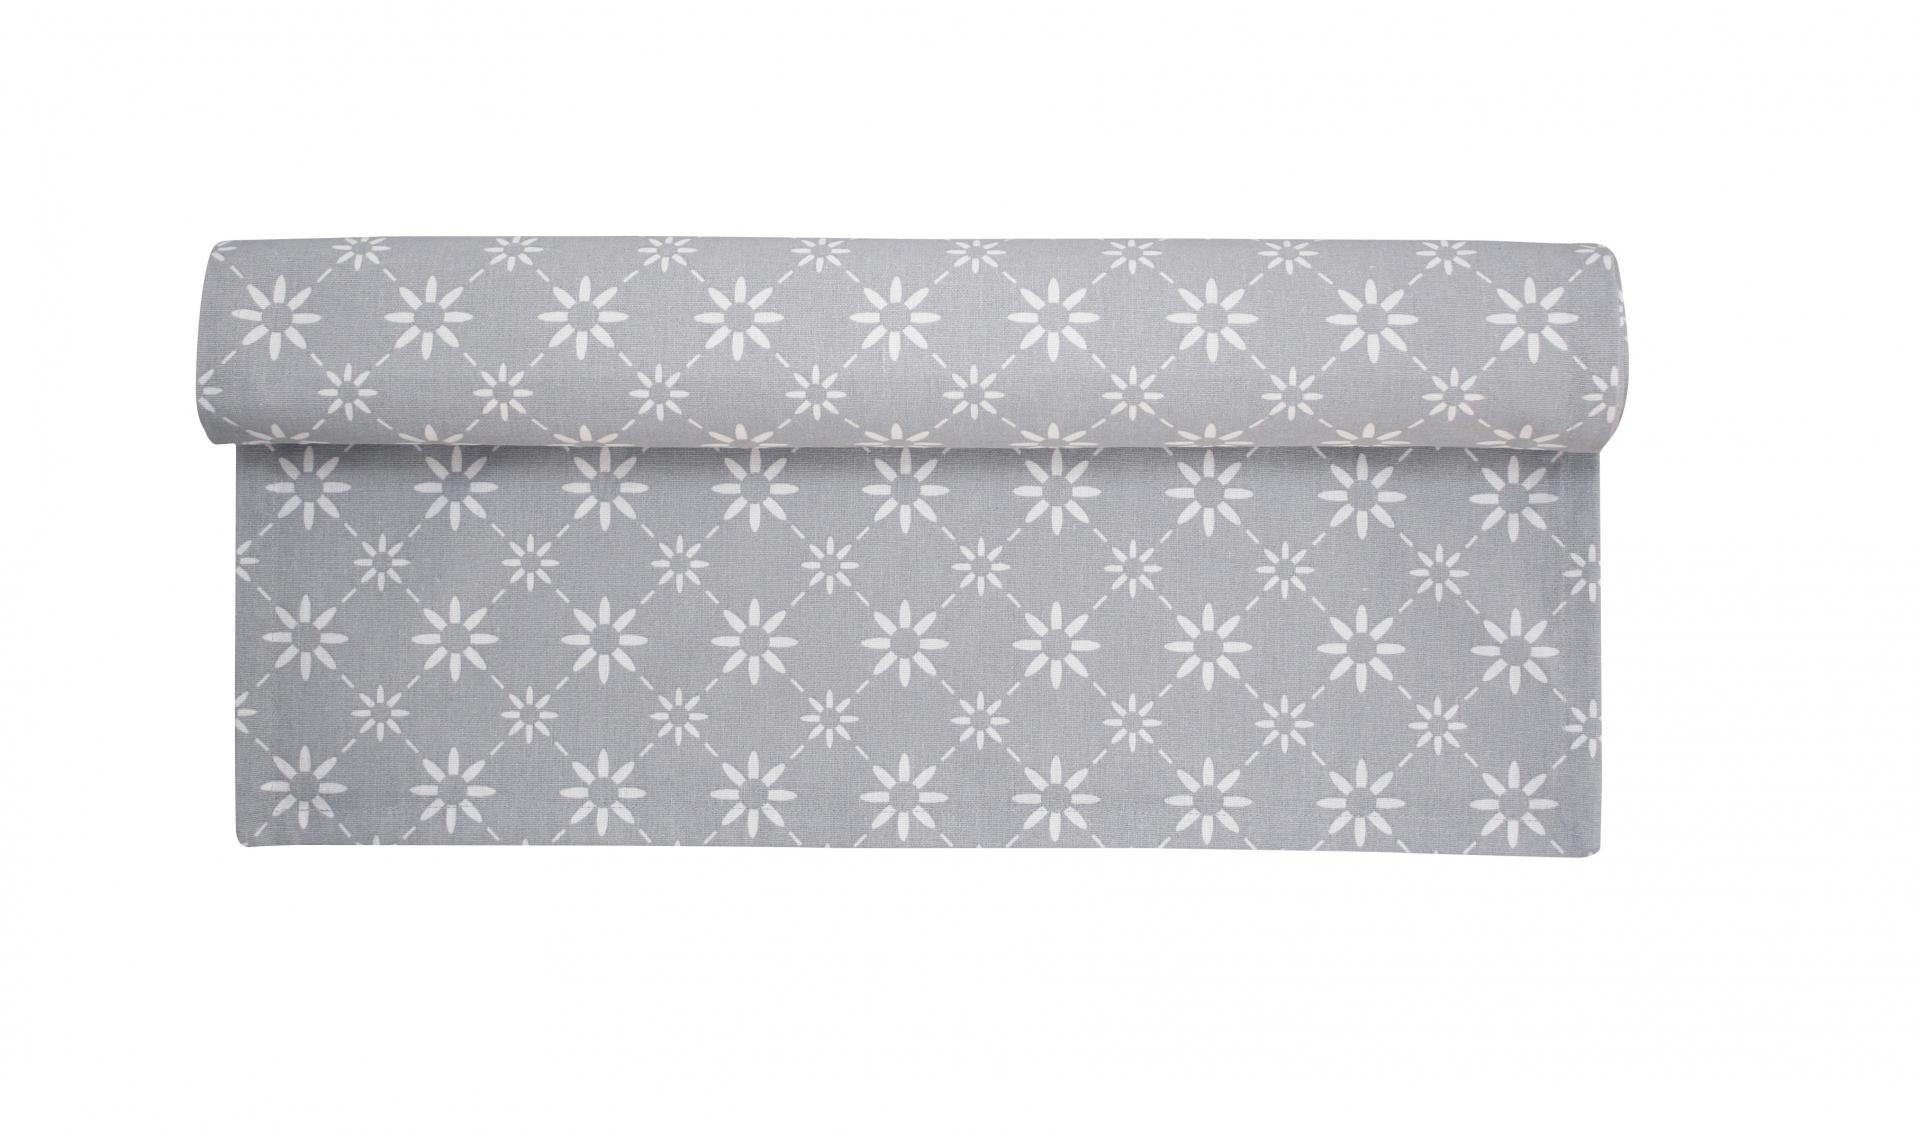 Krasilnikoff Bavlněný běhoun Grey diagonal, šedá barva, textil